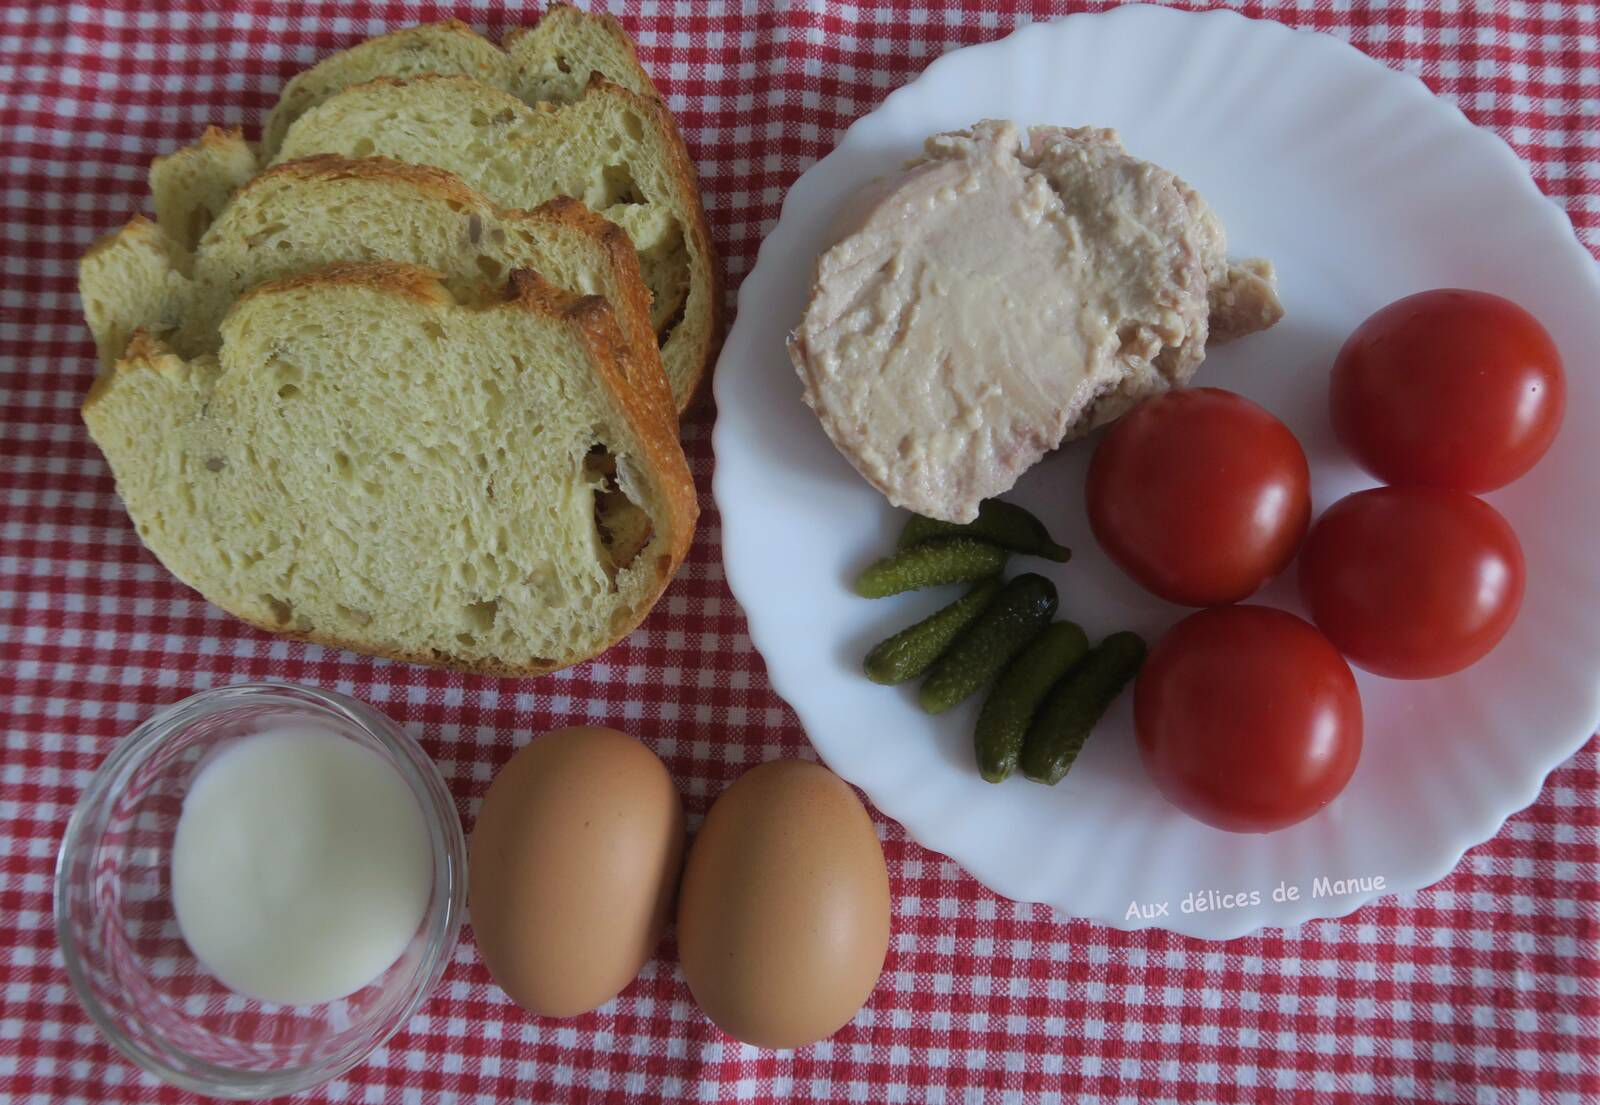 Bruschetta au thon, œufs durs et tomates